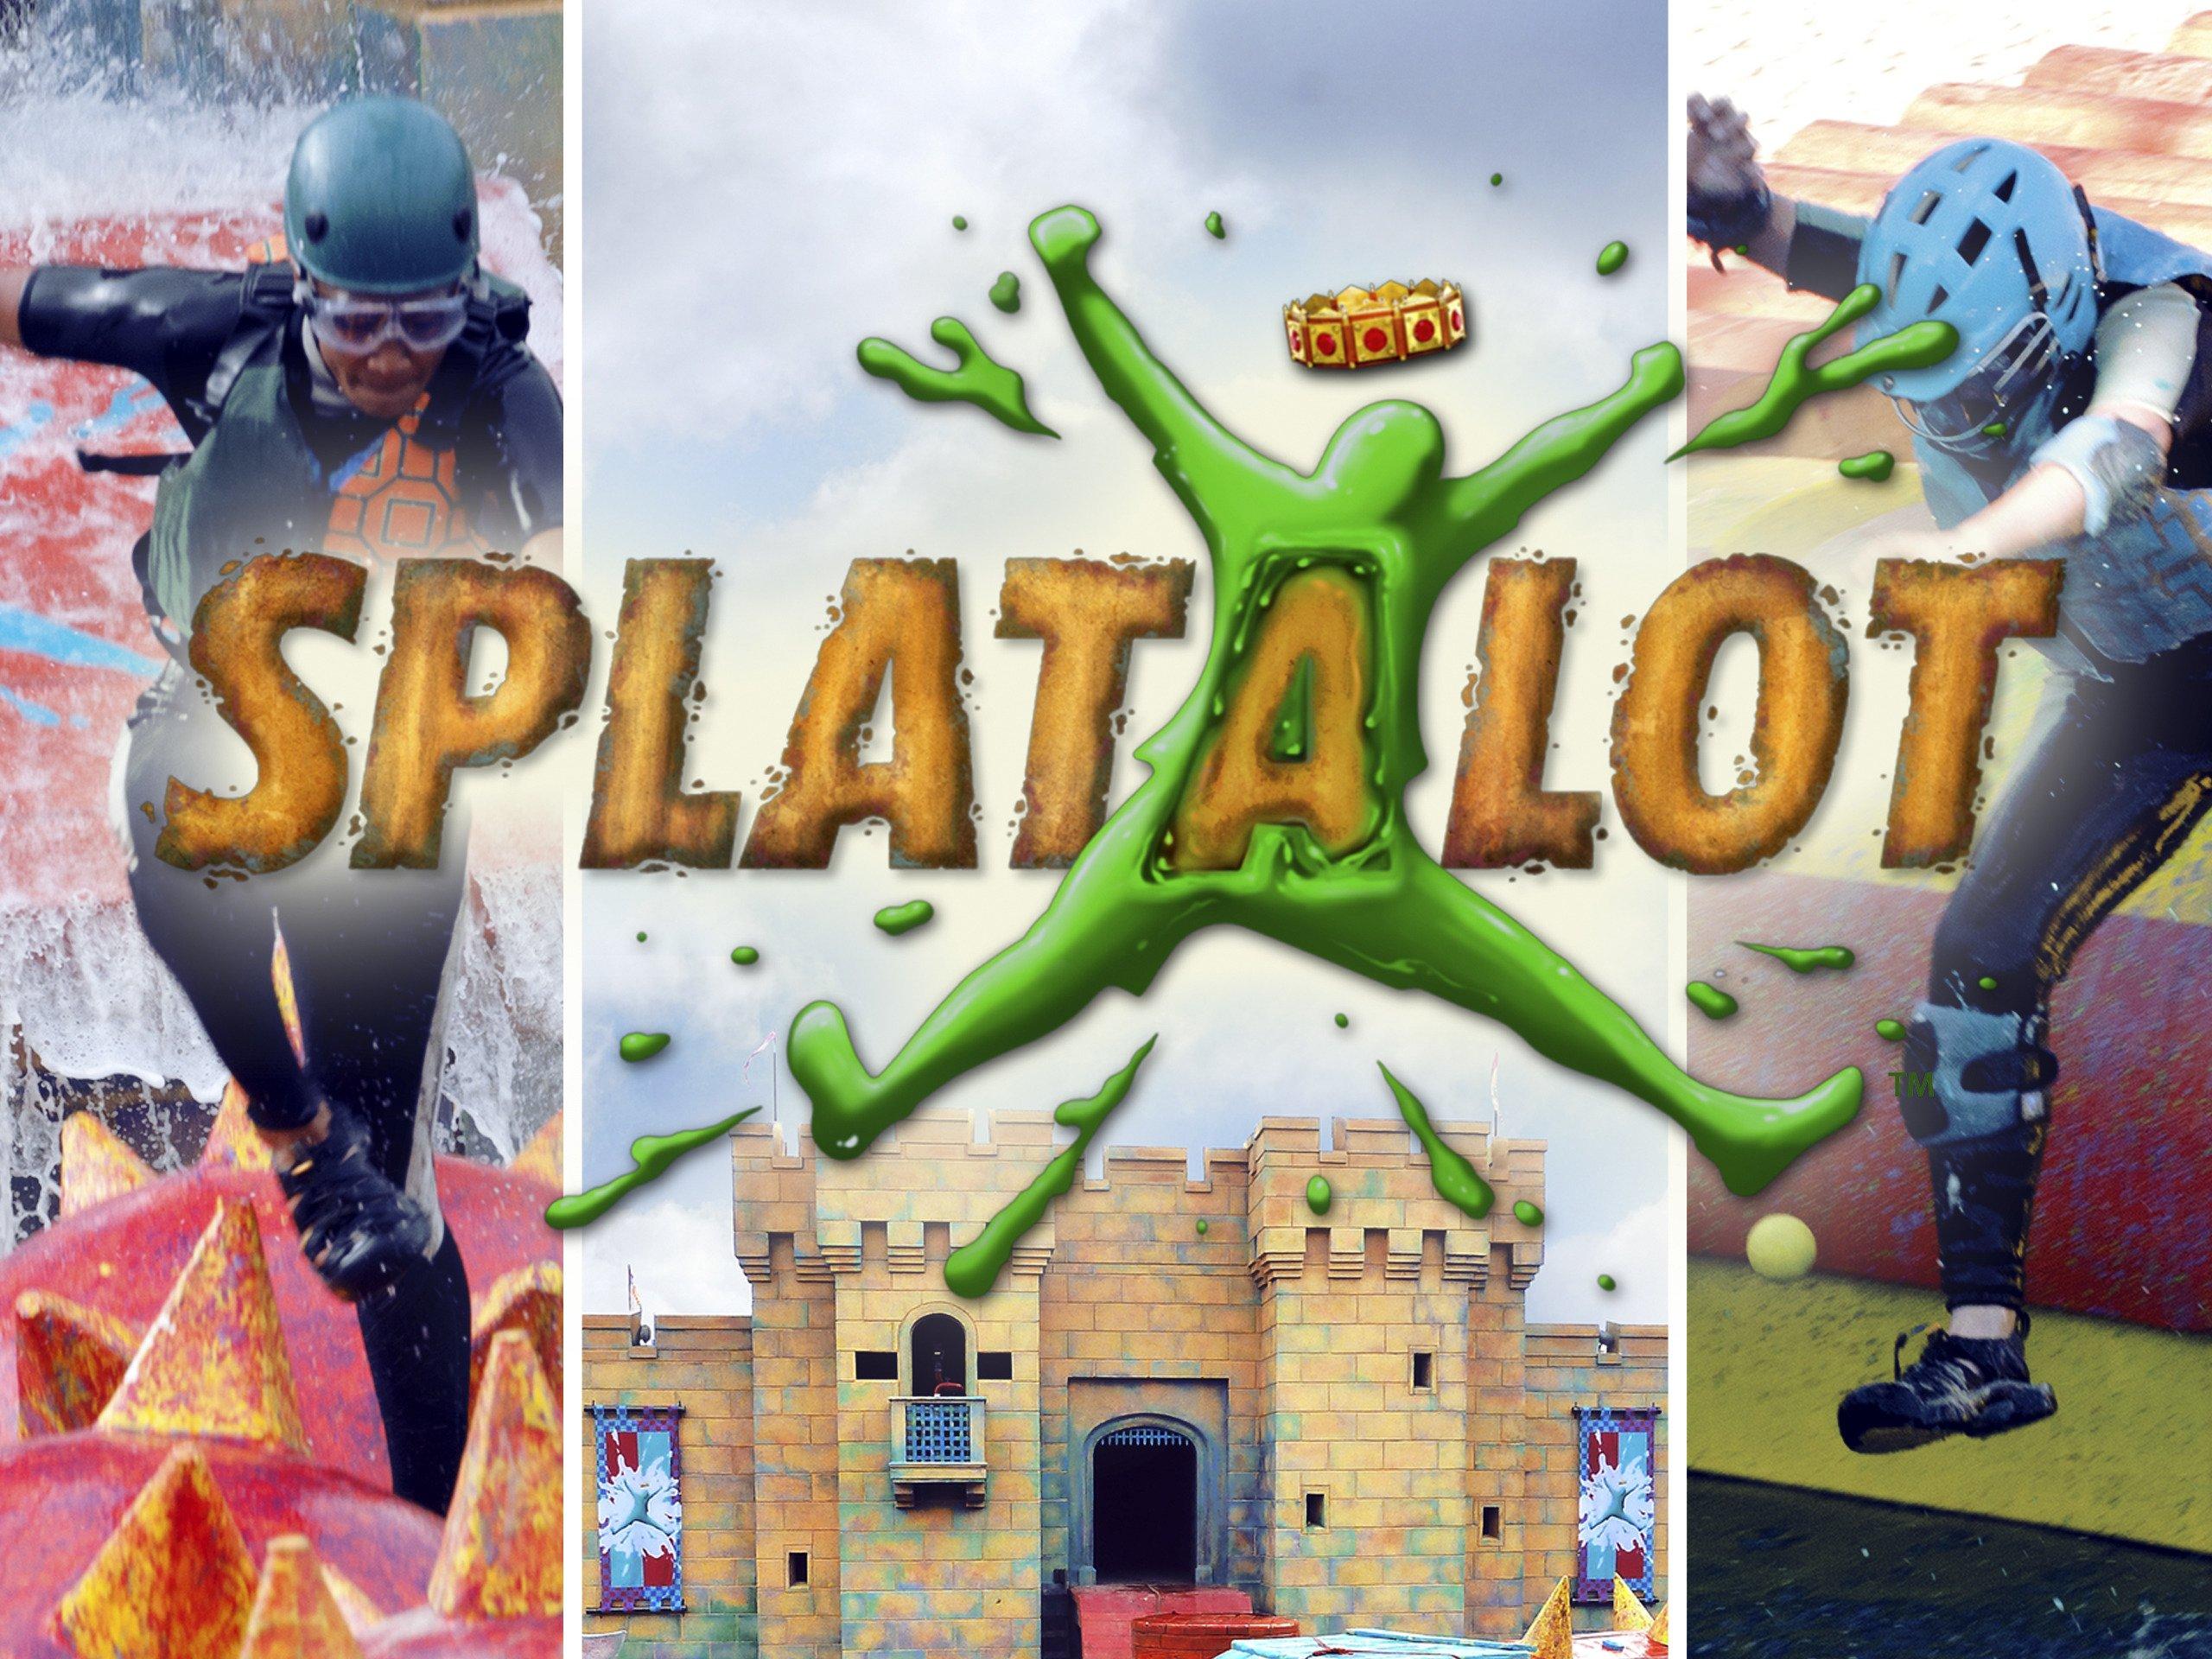 Amazon.com: Splatalot: Season 2: Jason Agnew, Matt Chin ...